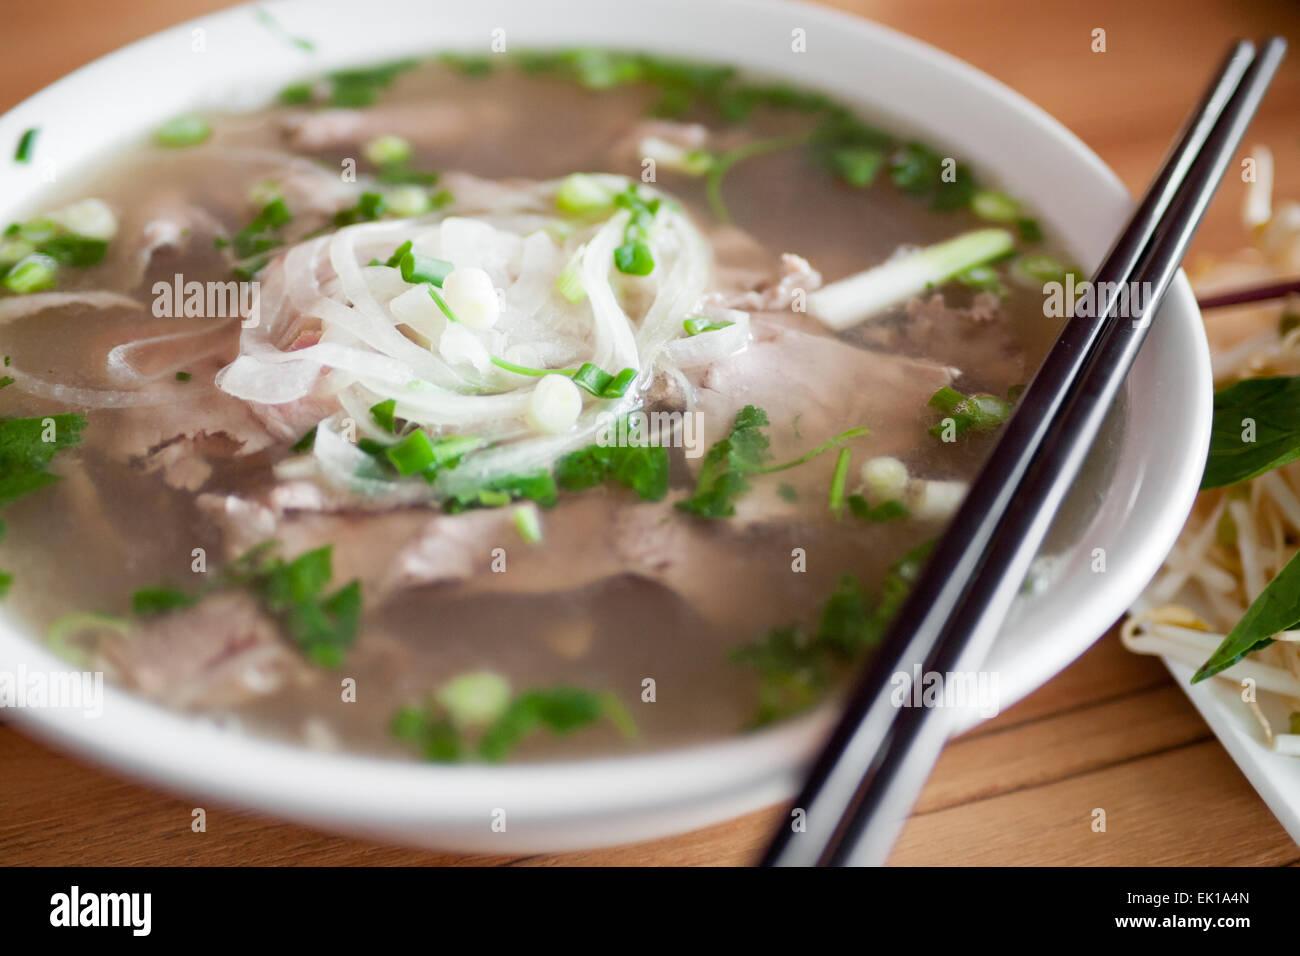 A bowl of beef brisket pho, a popular Vietnamese noodle soup. Stock Photo